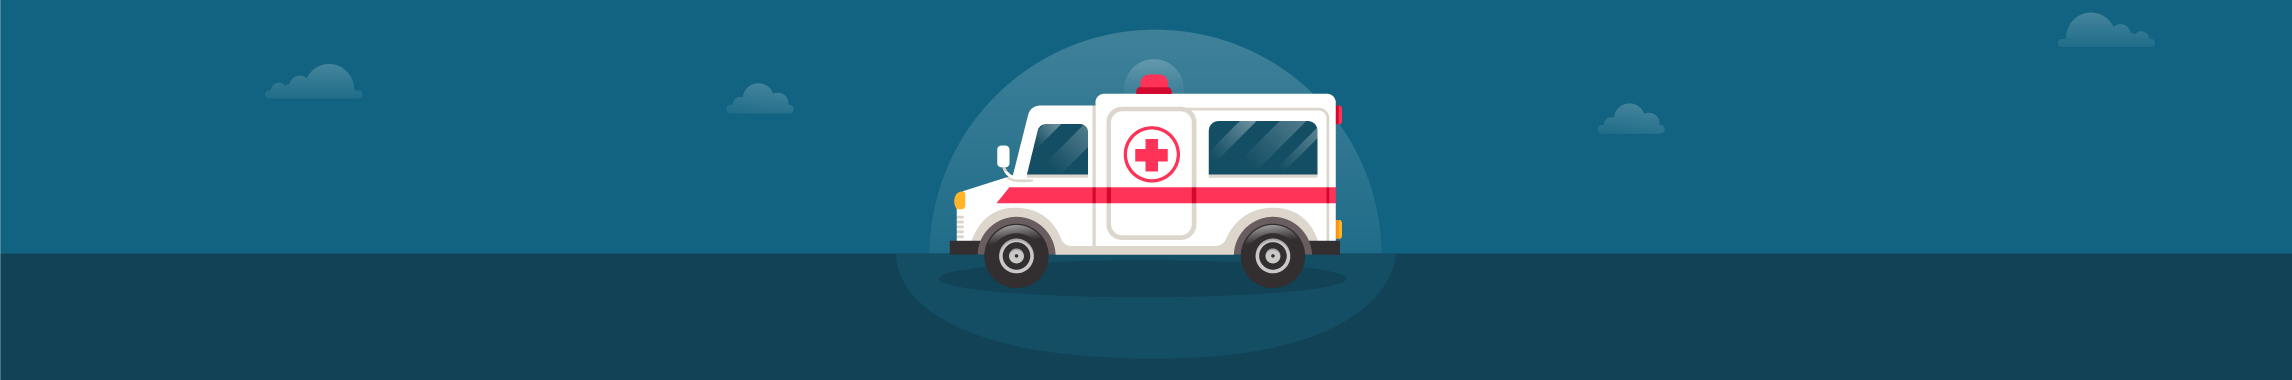 NHS ambulance symbolic of pension